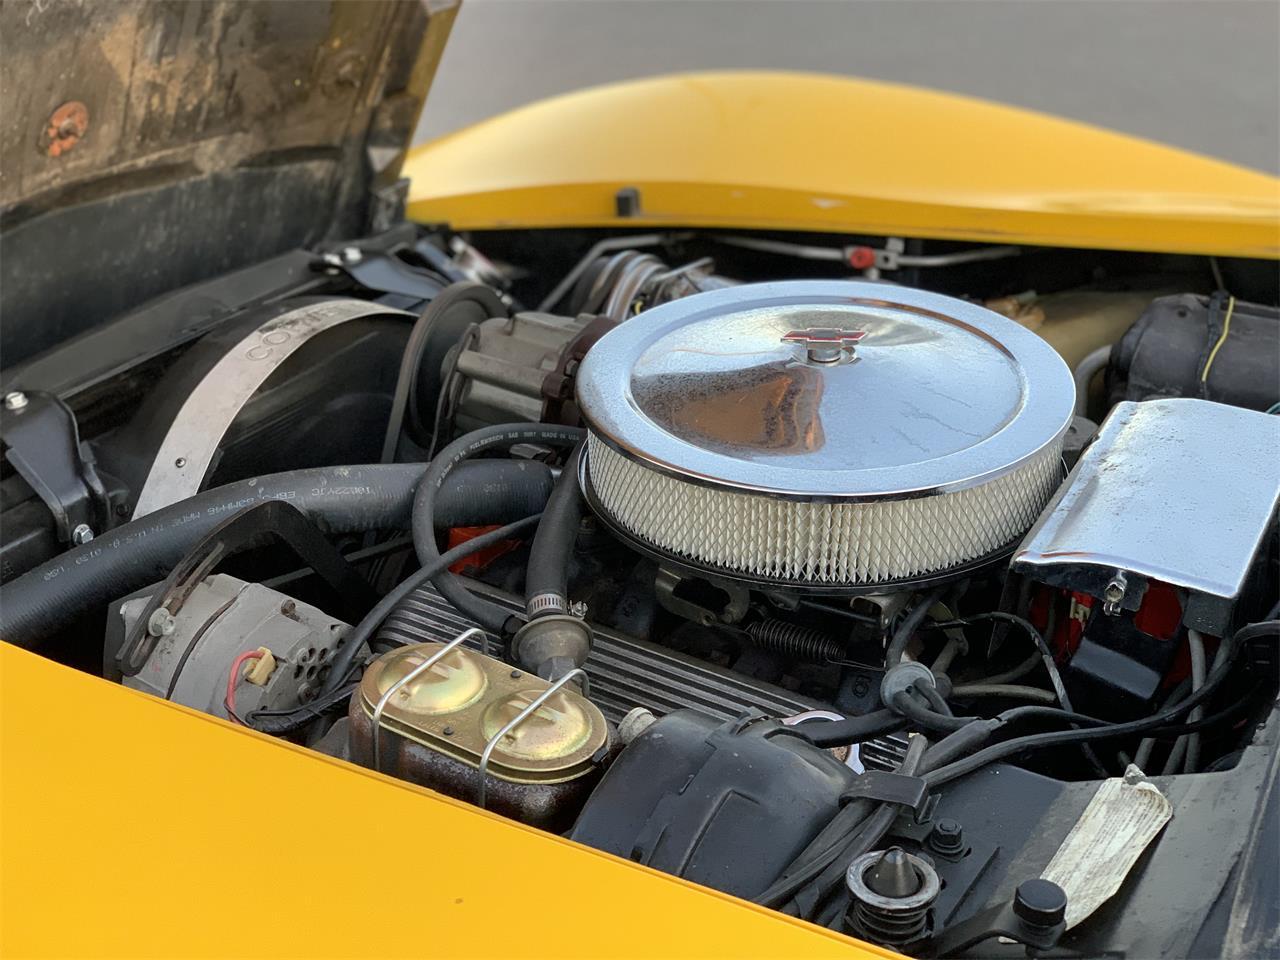 1975 Chevrolet Corvette (CC-1244111) for sale in Hollister, California